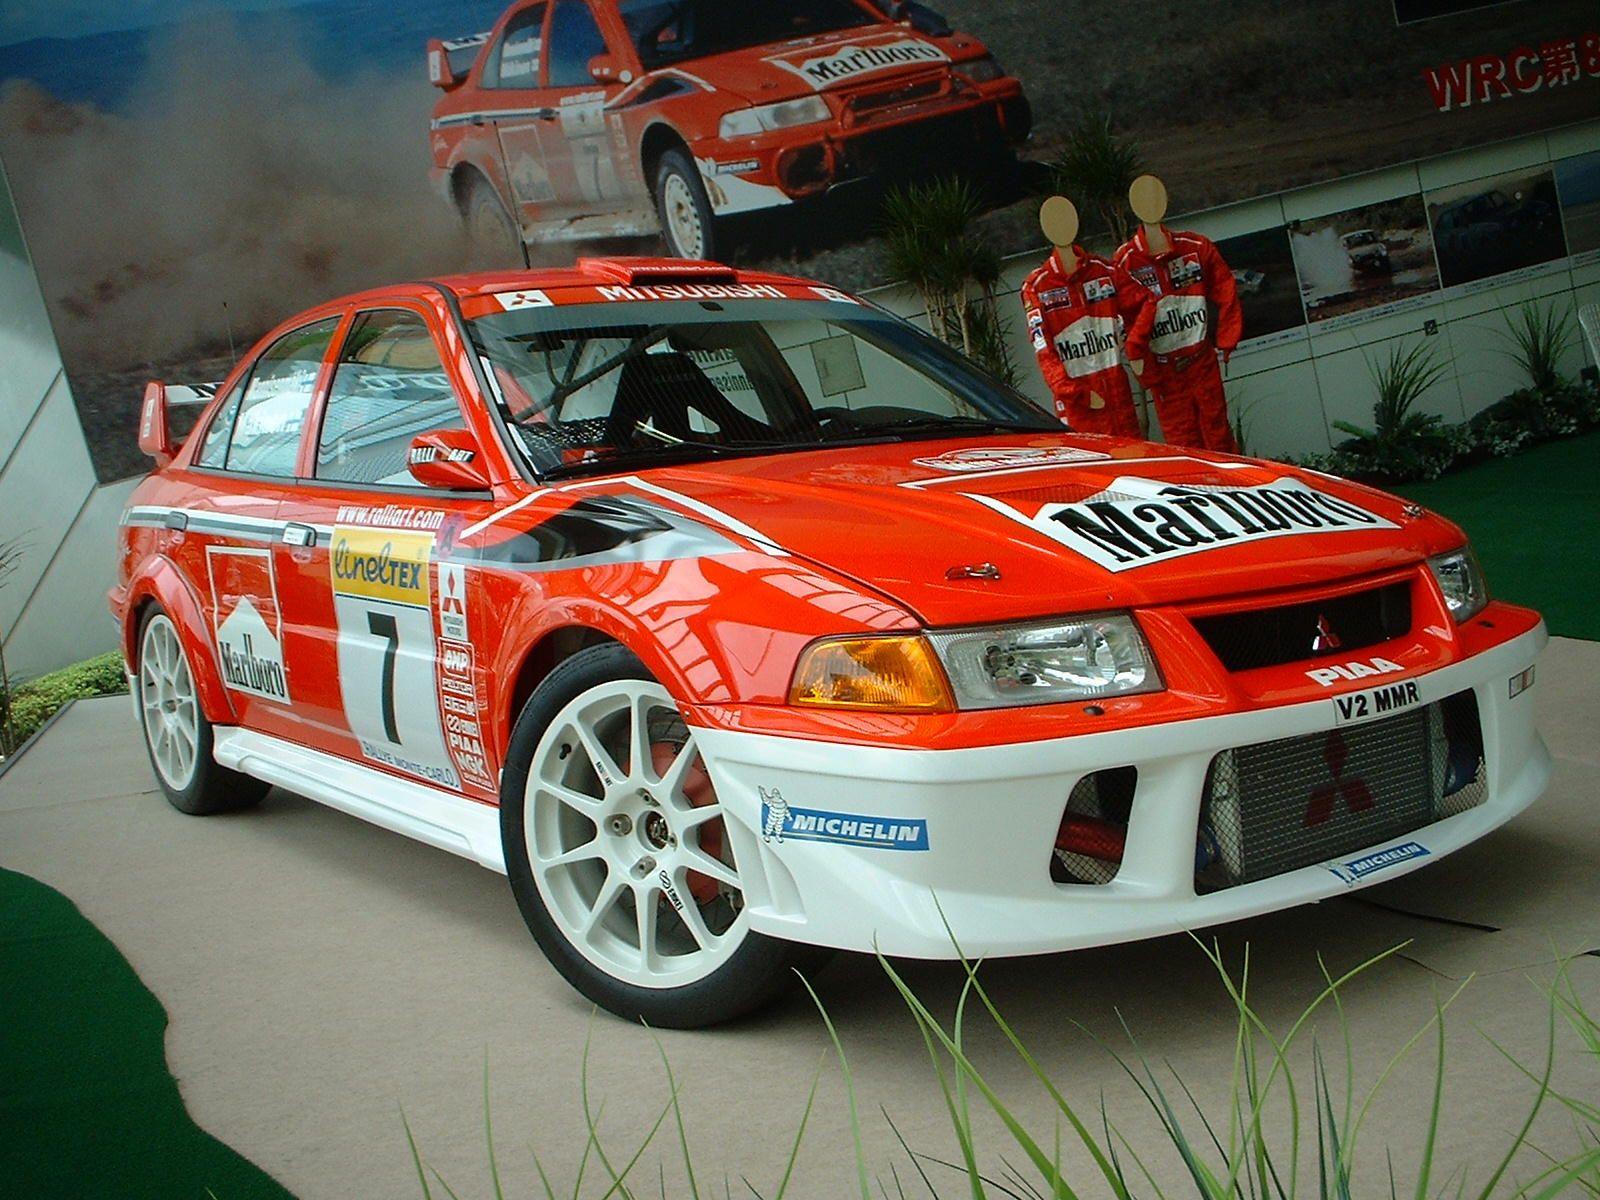 7th 2001 MITSUBISHI LANCER EVOLUTION VII RS (BY SUN AUTOMOBILE)